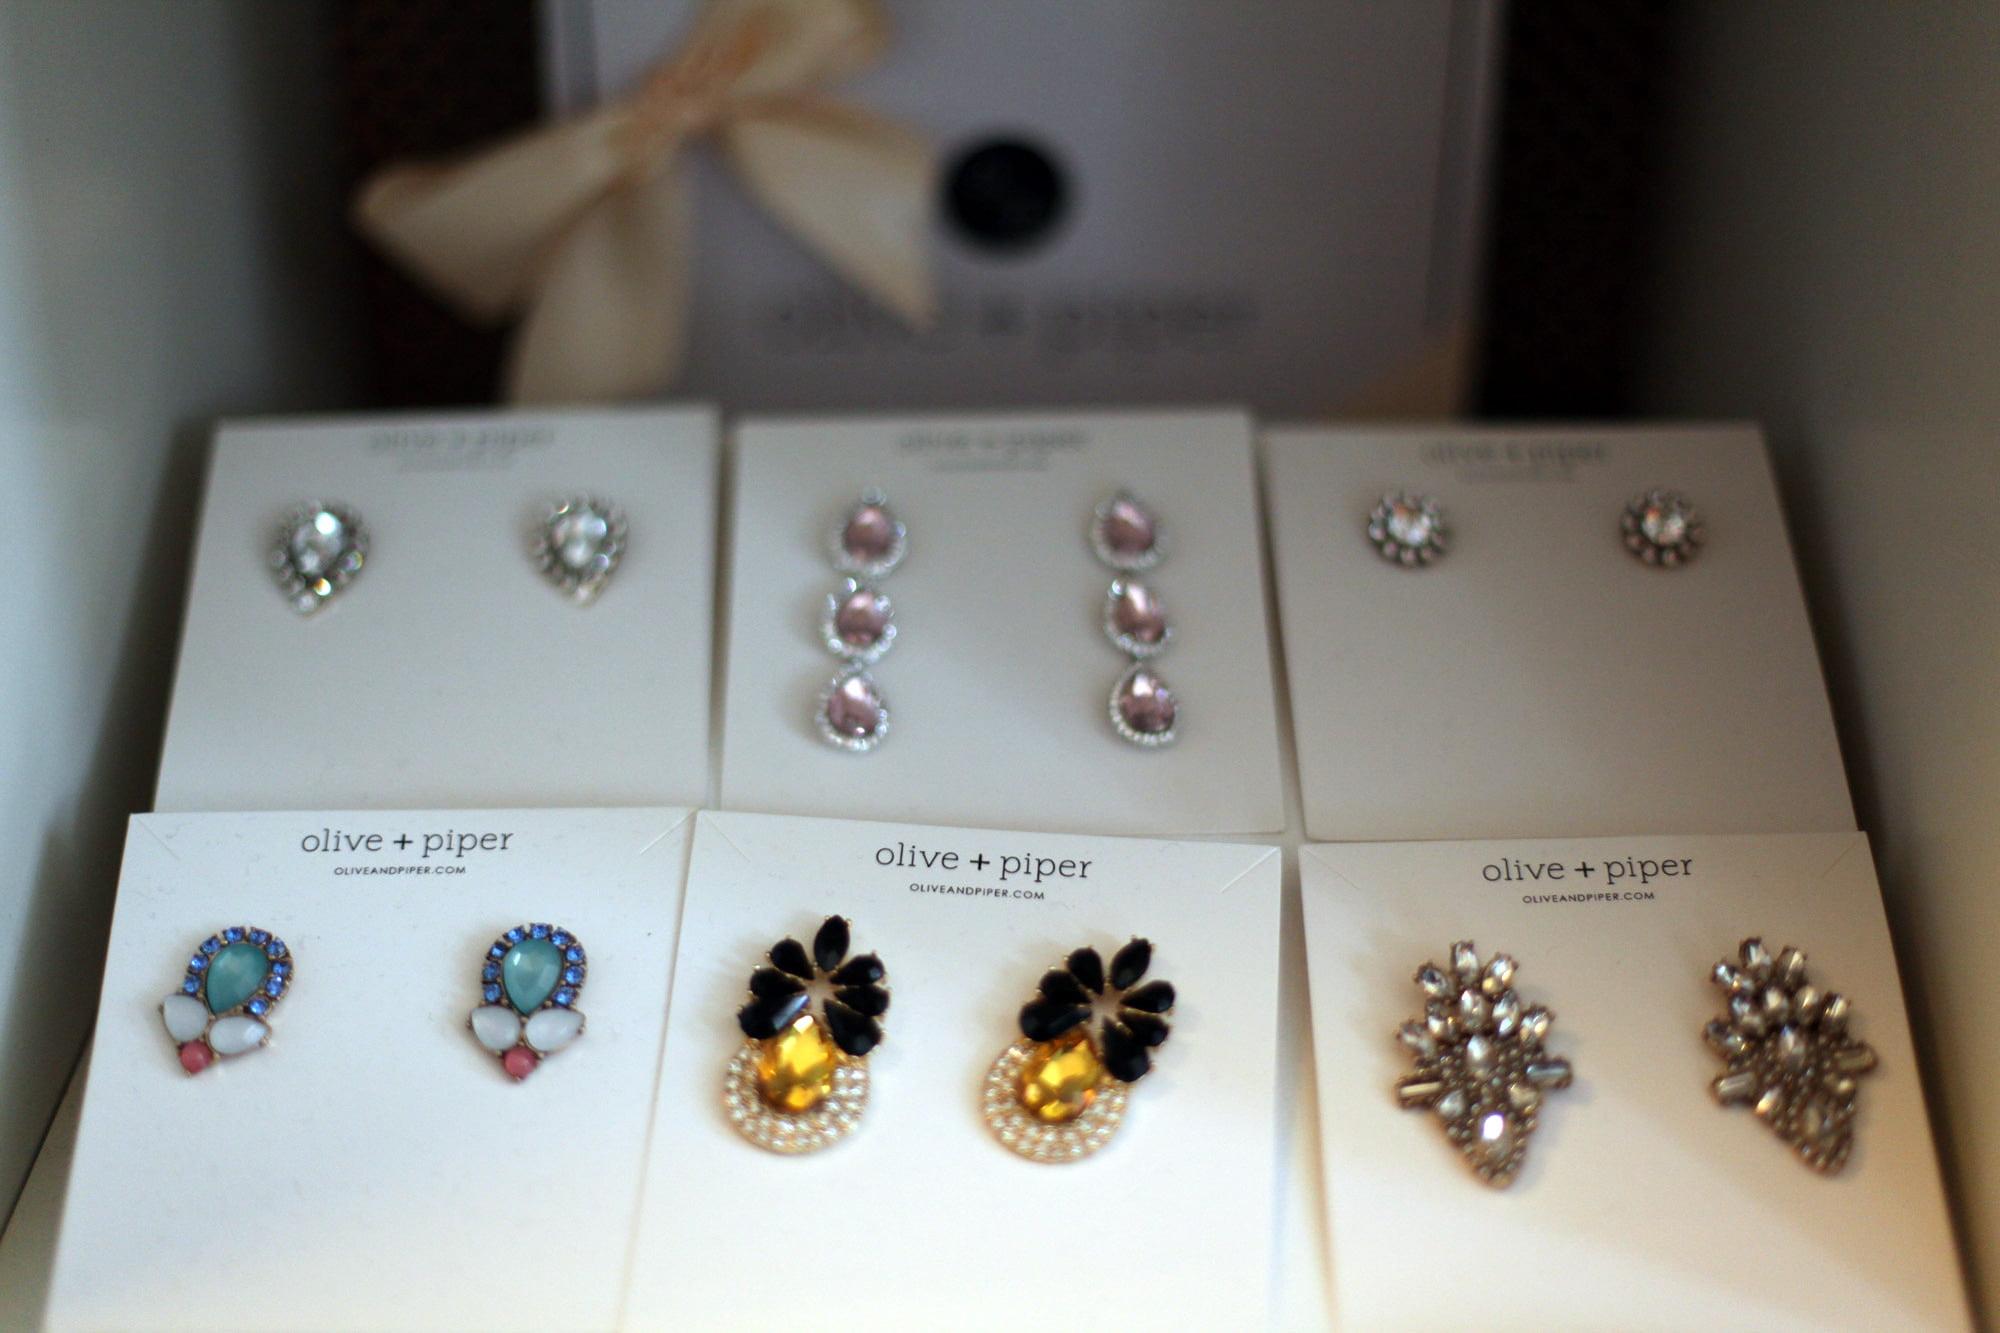 olive + piper earrings